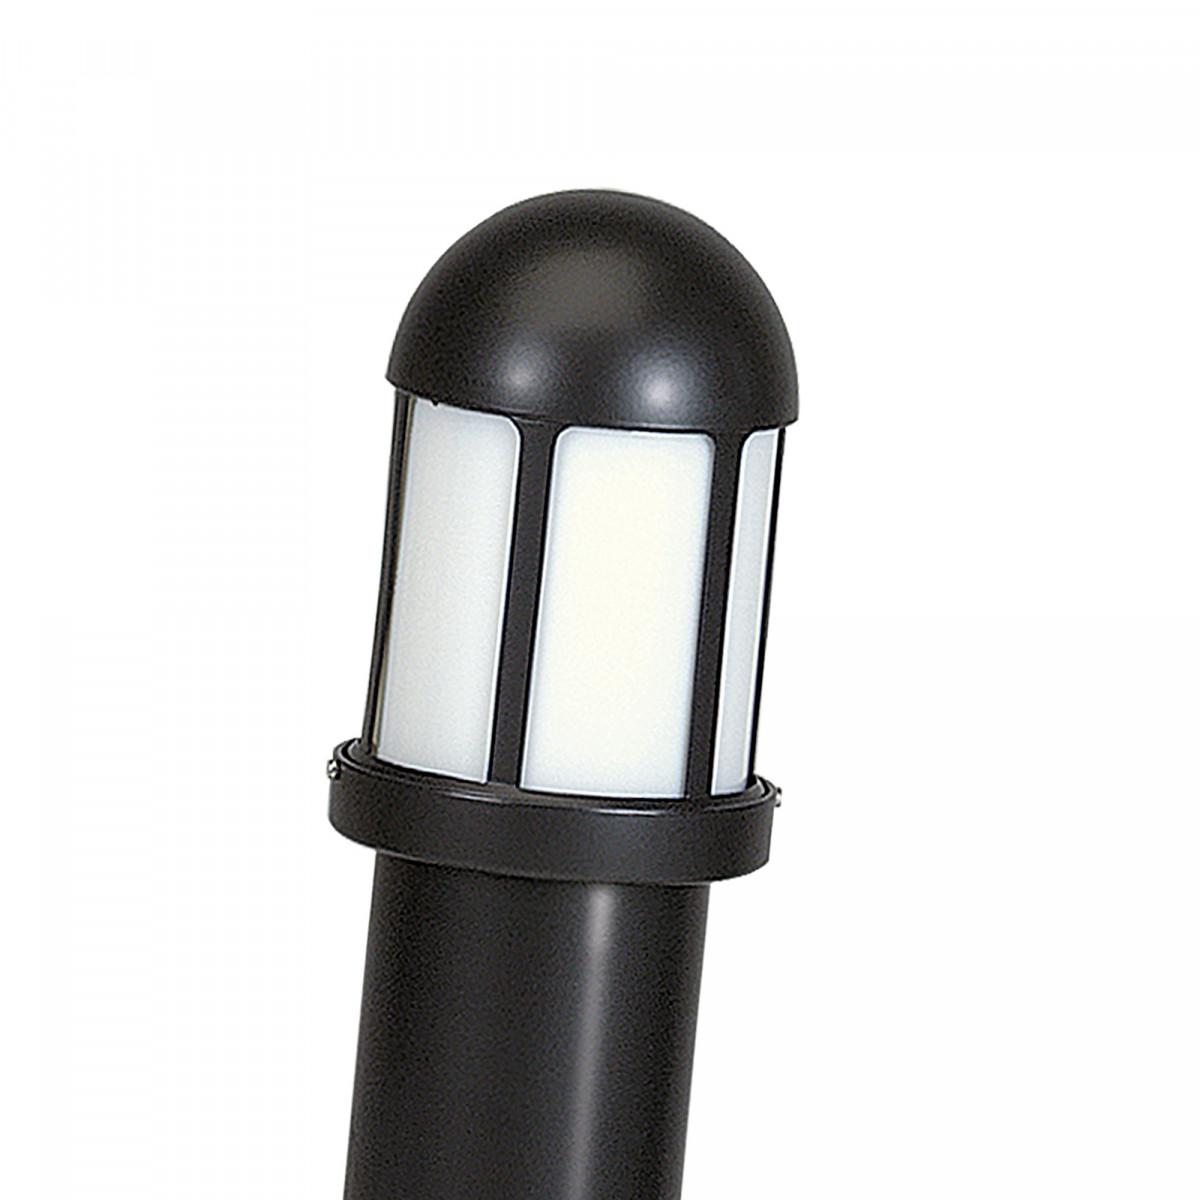 Brandaris 2 Tuinlamp (5058) - KS Verlichting - Tuinlampen